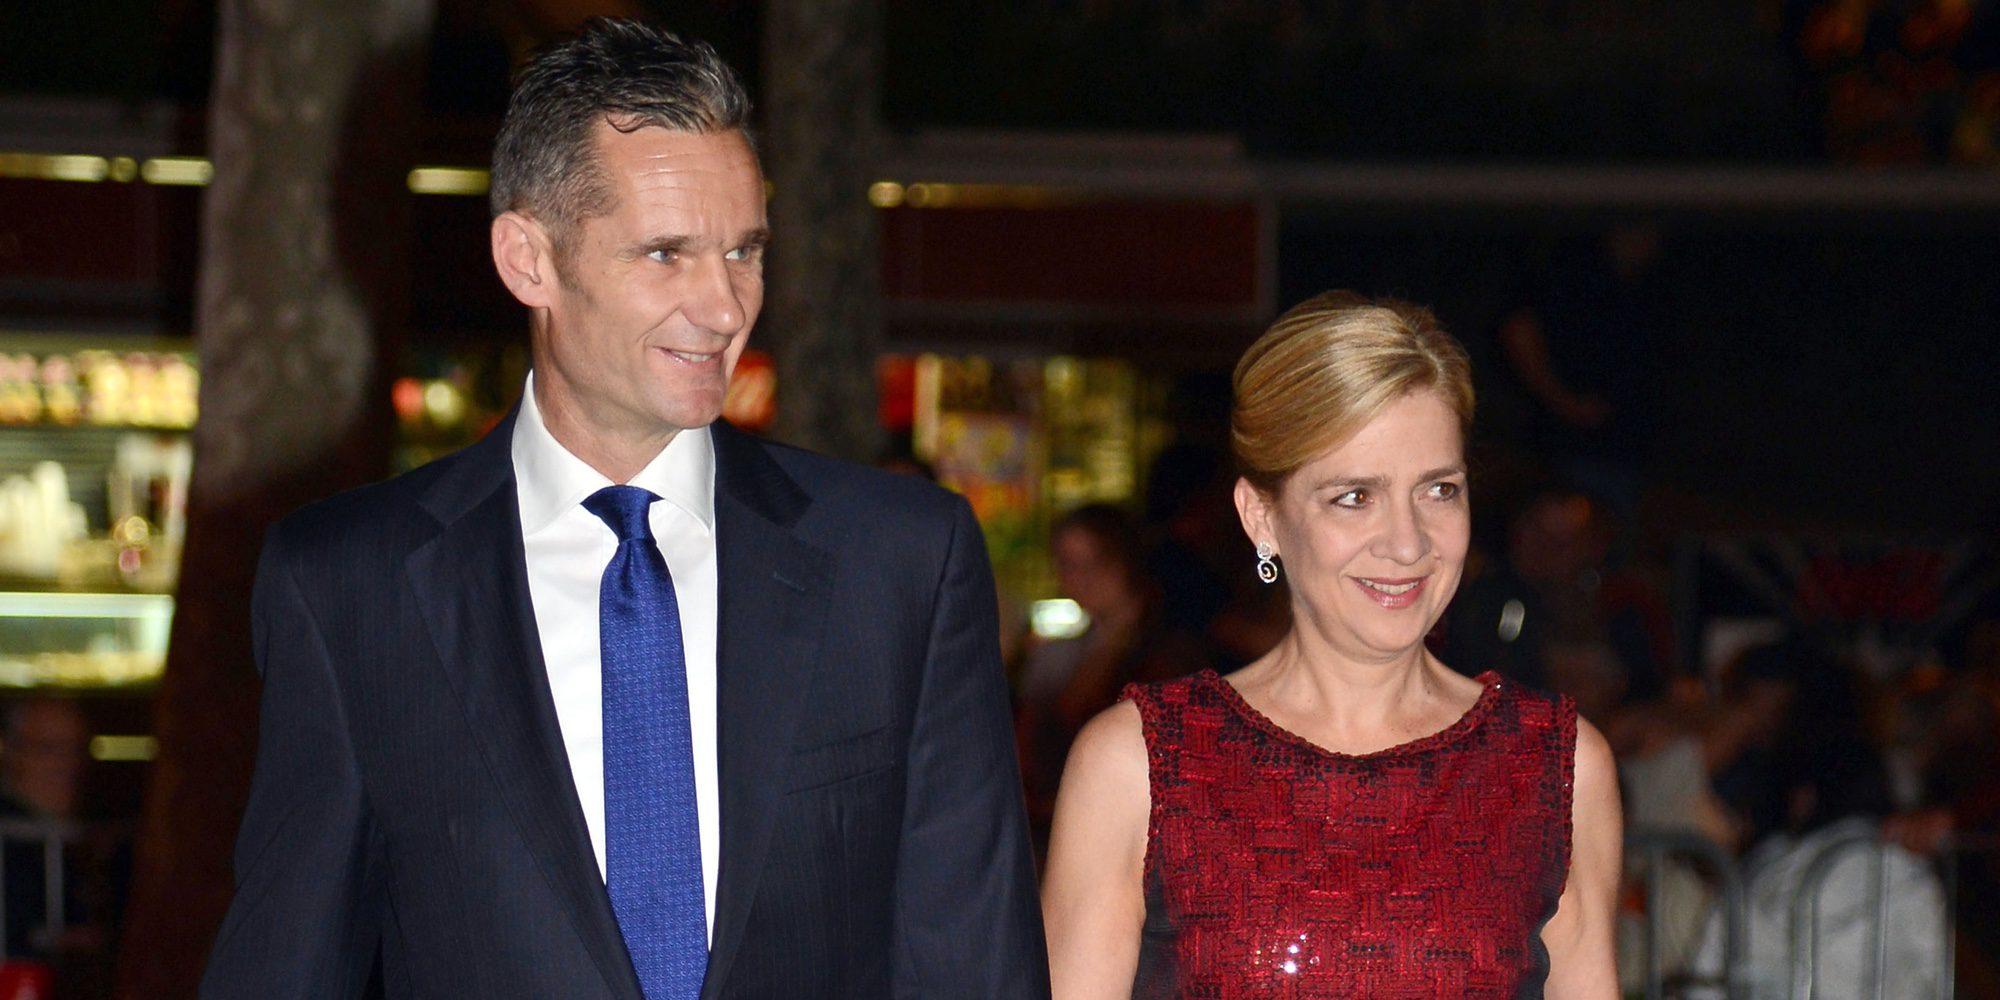 La Infanta Cristina e Iñaki Urdangarin pasan la Semana Santa en Ciudad Real alejados de la Zarzuela